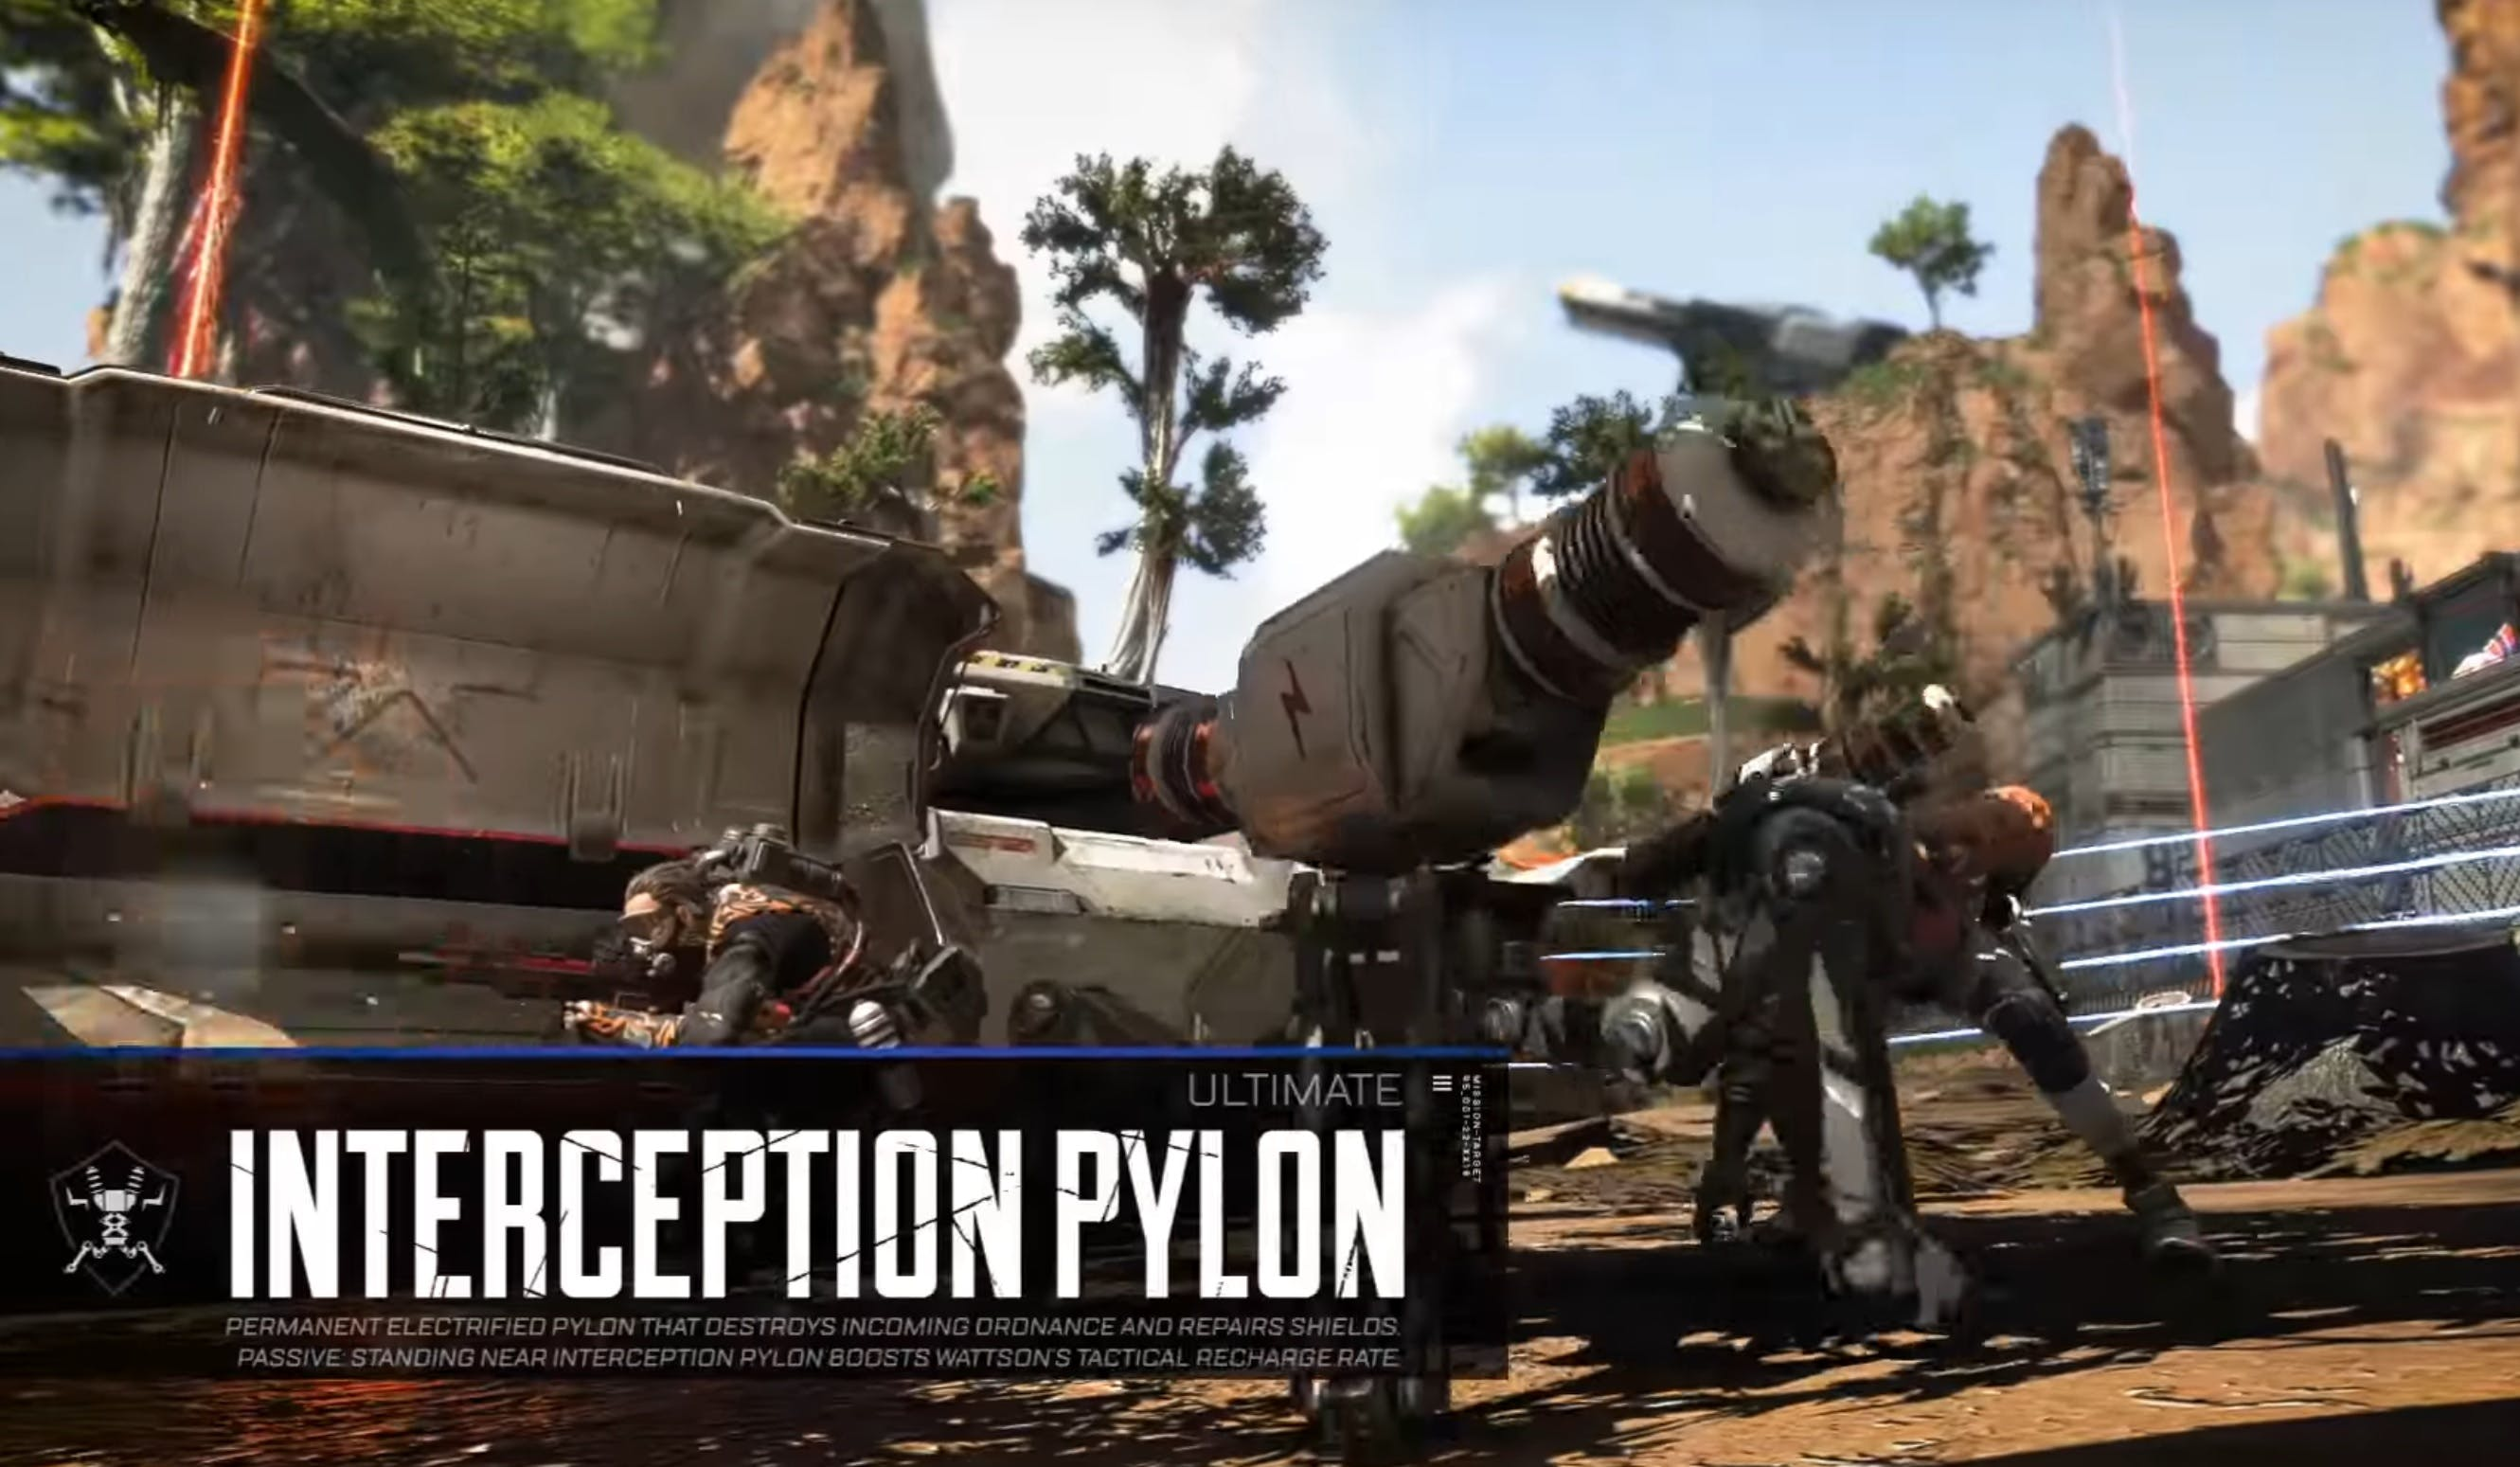 apex legends wattson abilities interception pylon